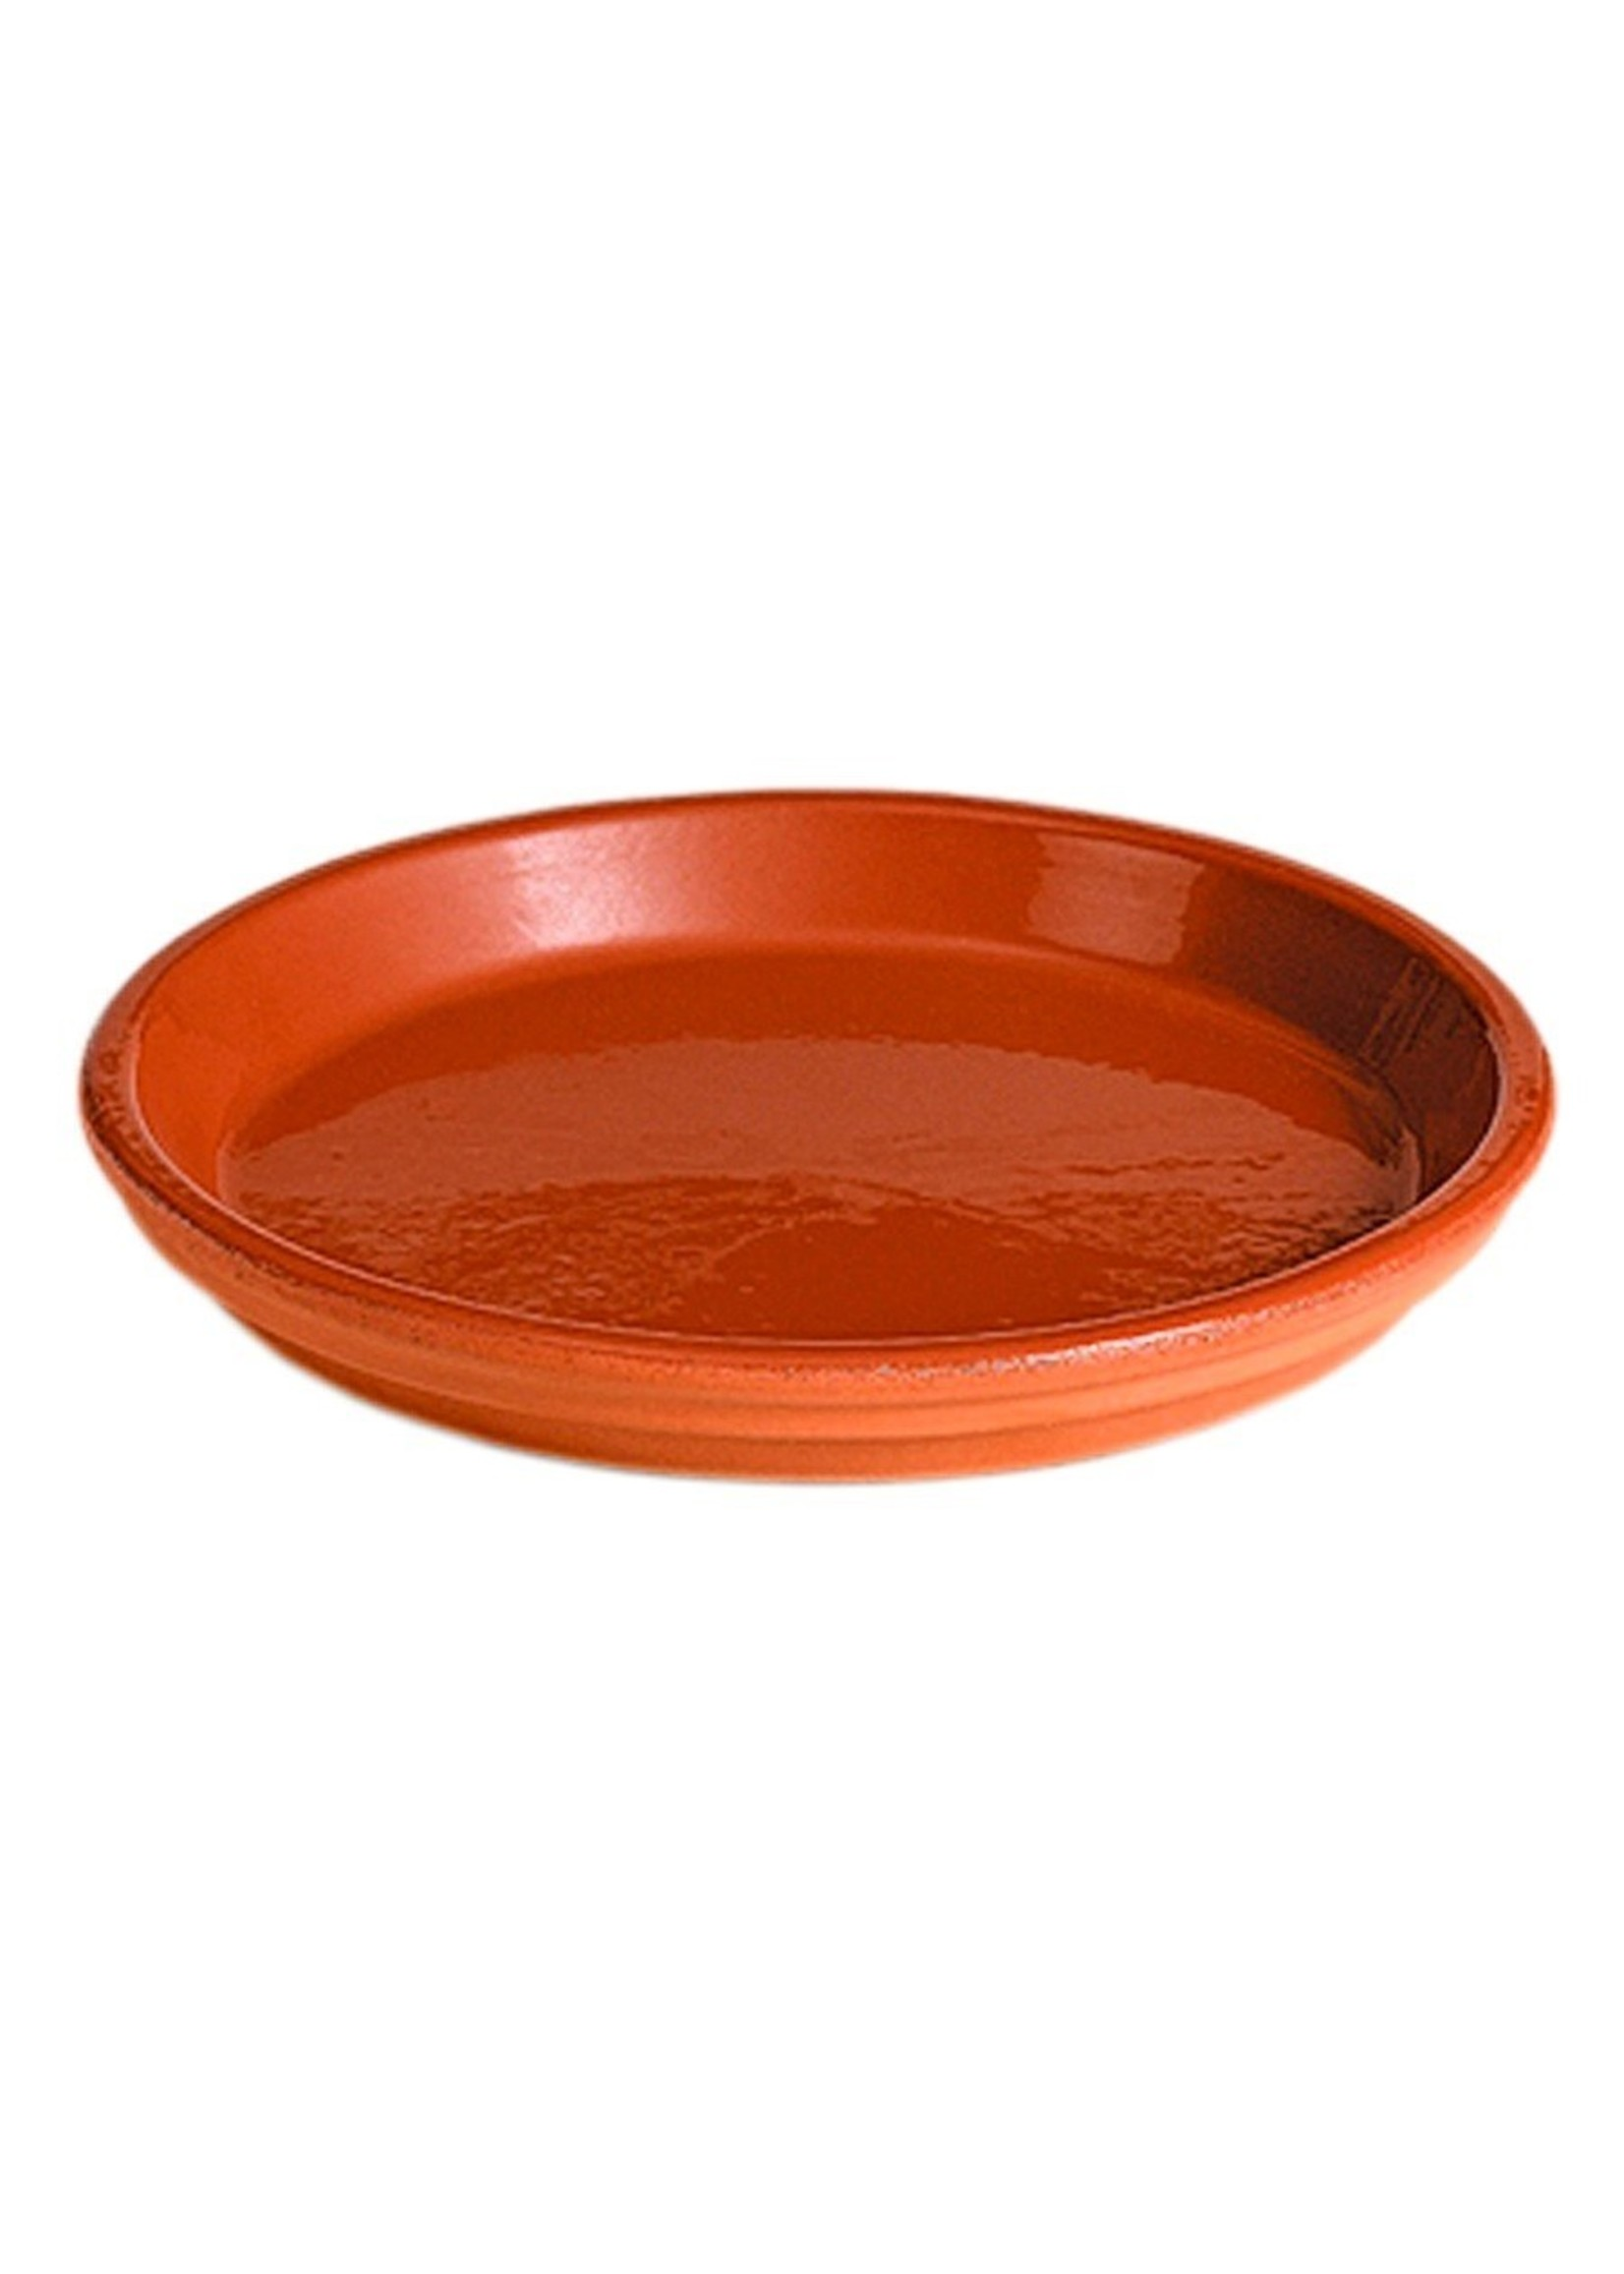 19cm Glazed Saucer